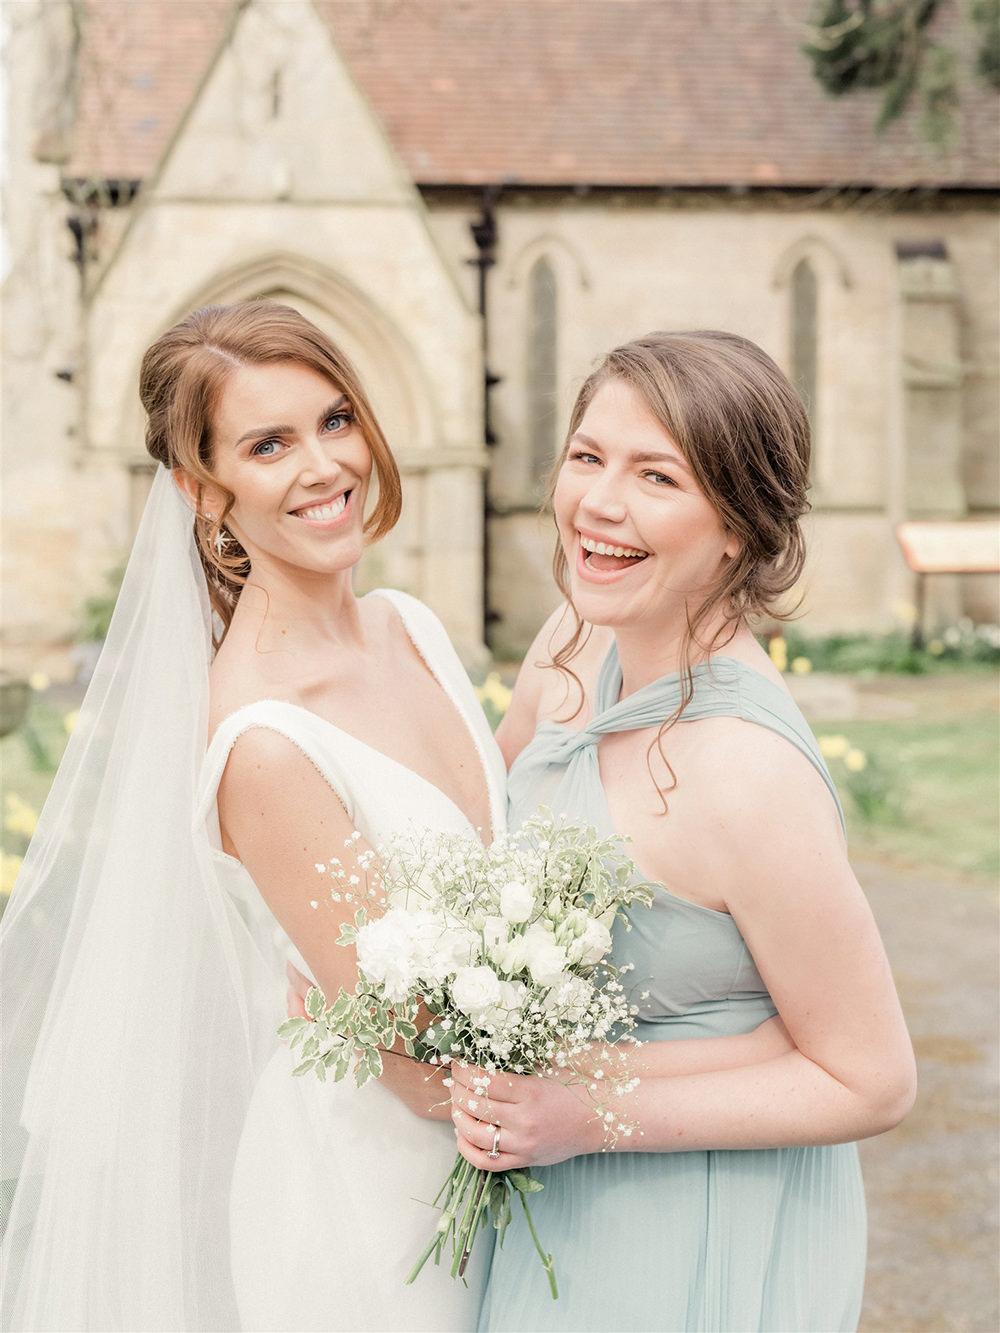 Bridesmaid Dress Sage Green Lockdown Wedding Carn Patrick Photography